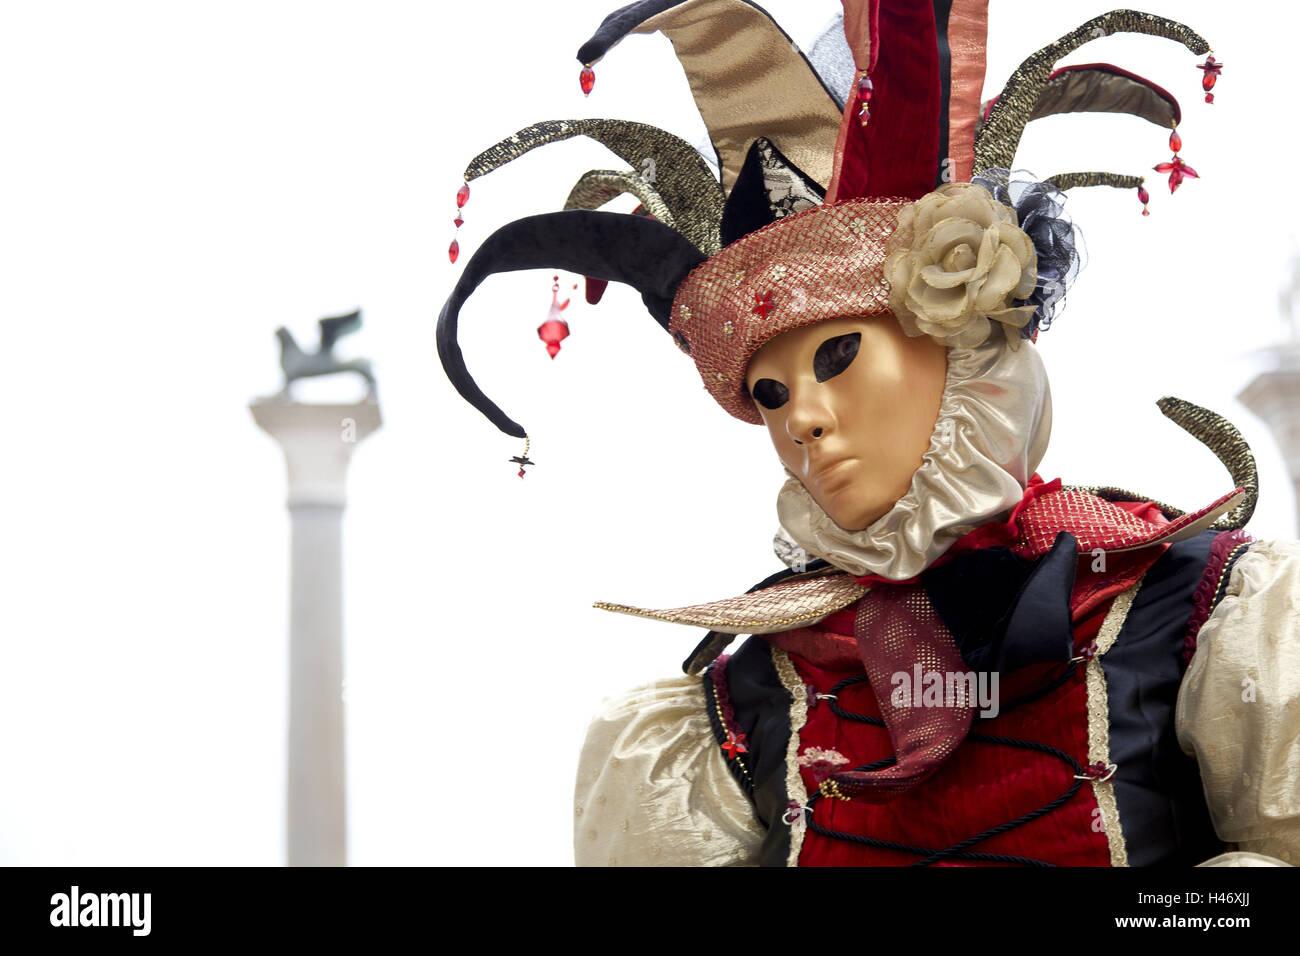 Italien, Venedig, Karneval, Person, Masken, Porträt, gewellt, aussen ...